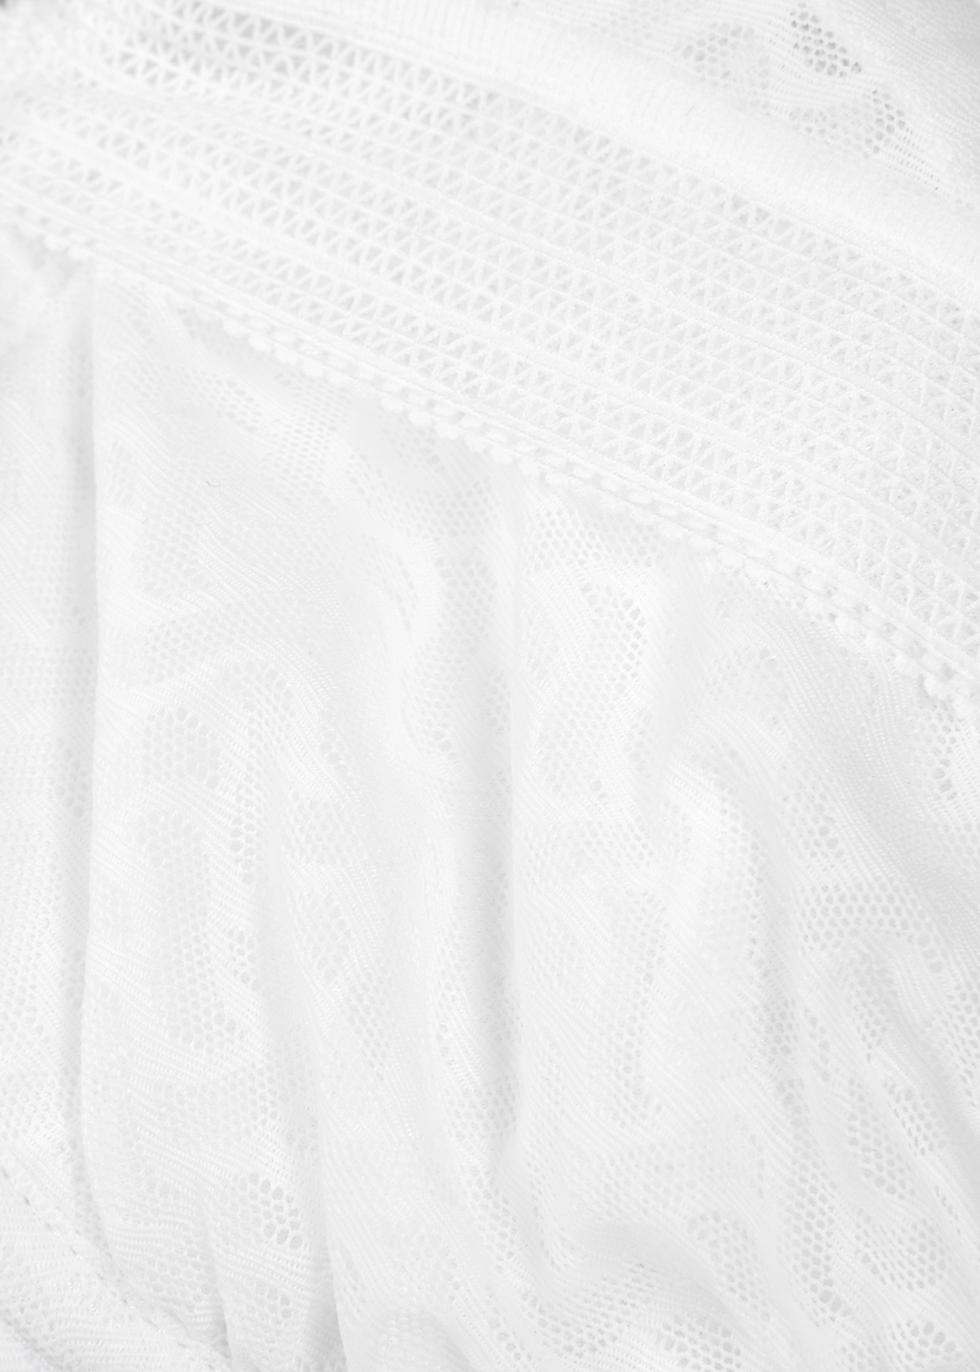 Aphrodite white lace plunge bra - Wacoal